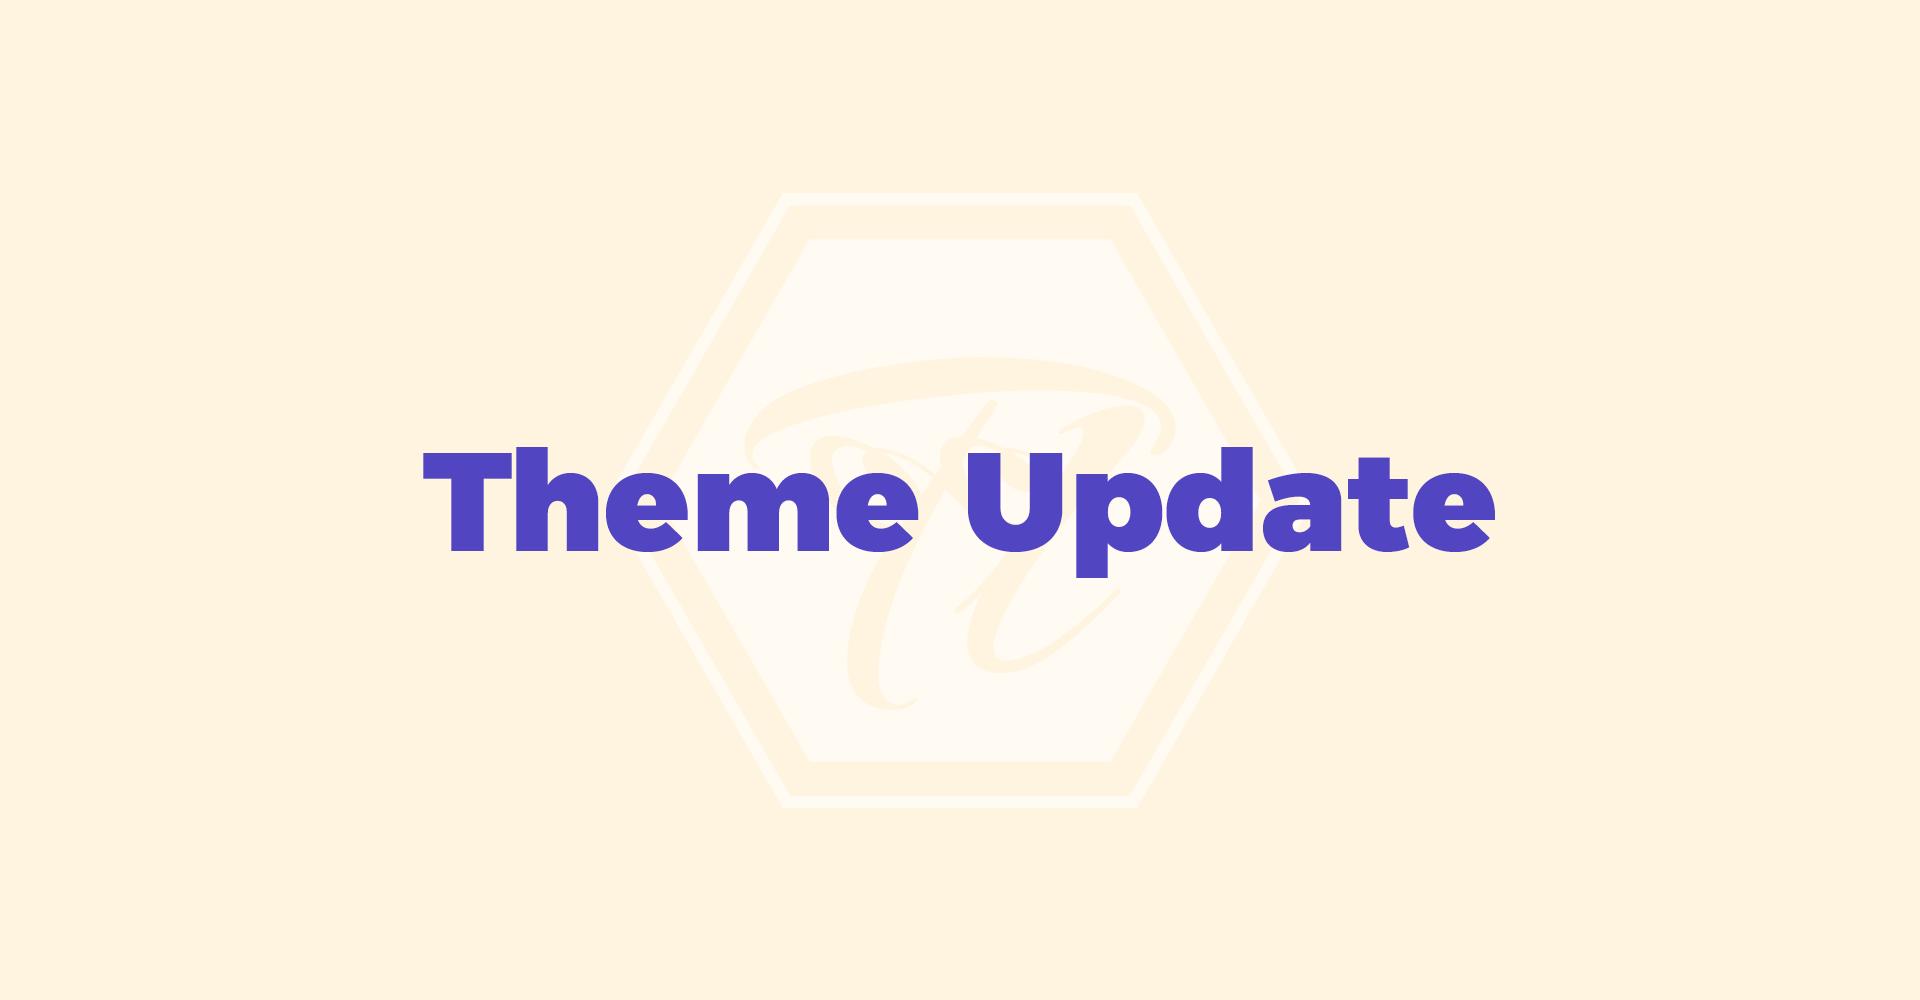 theme_update 1 1